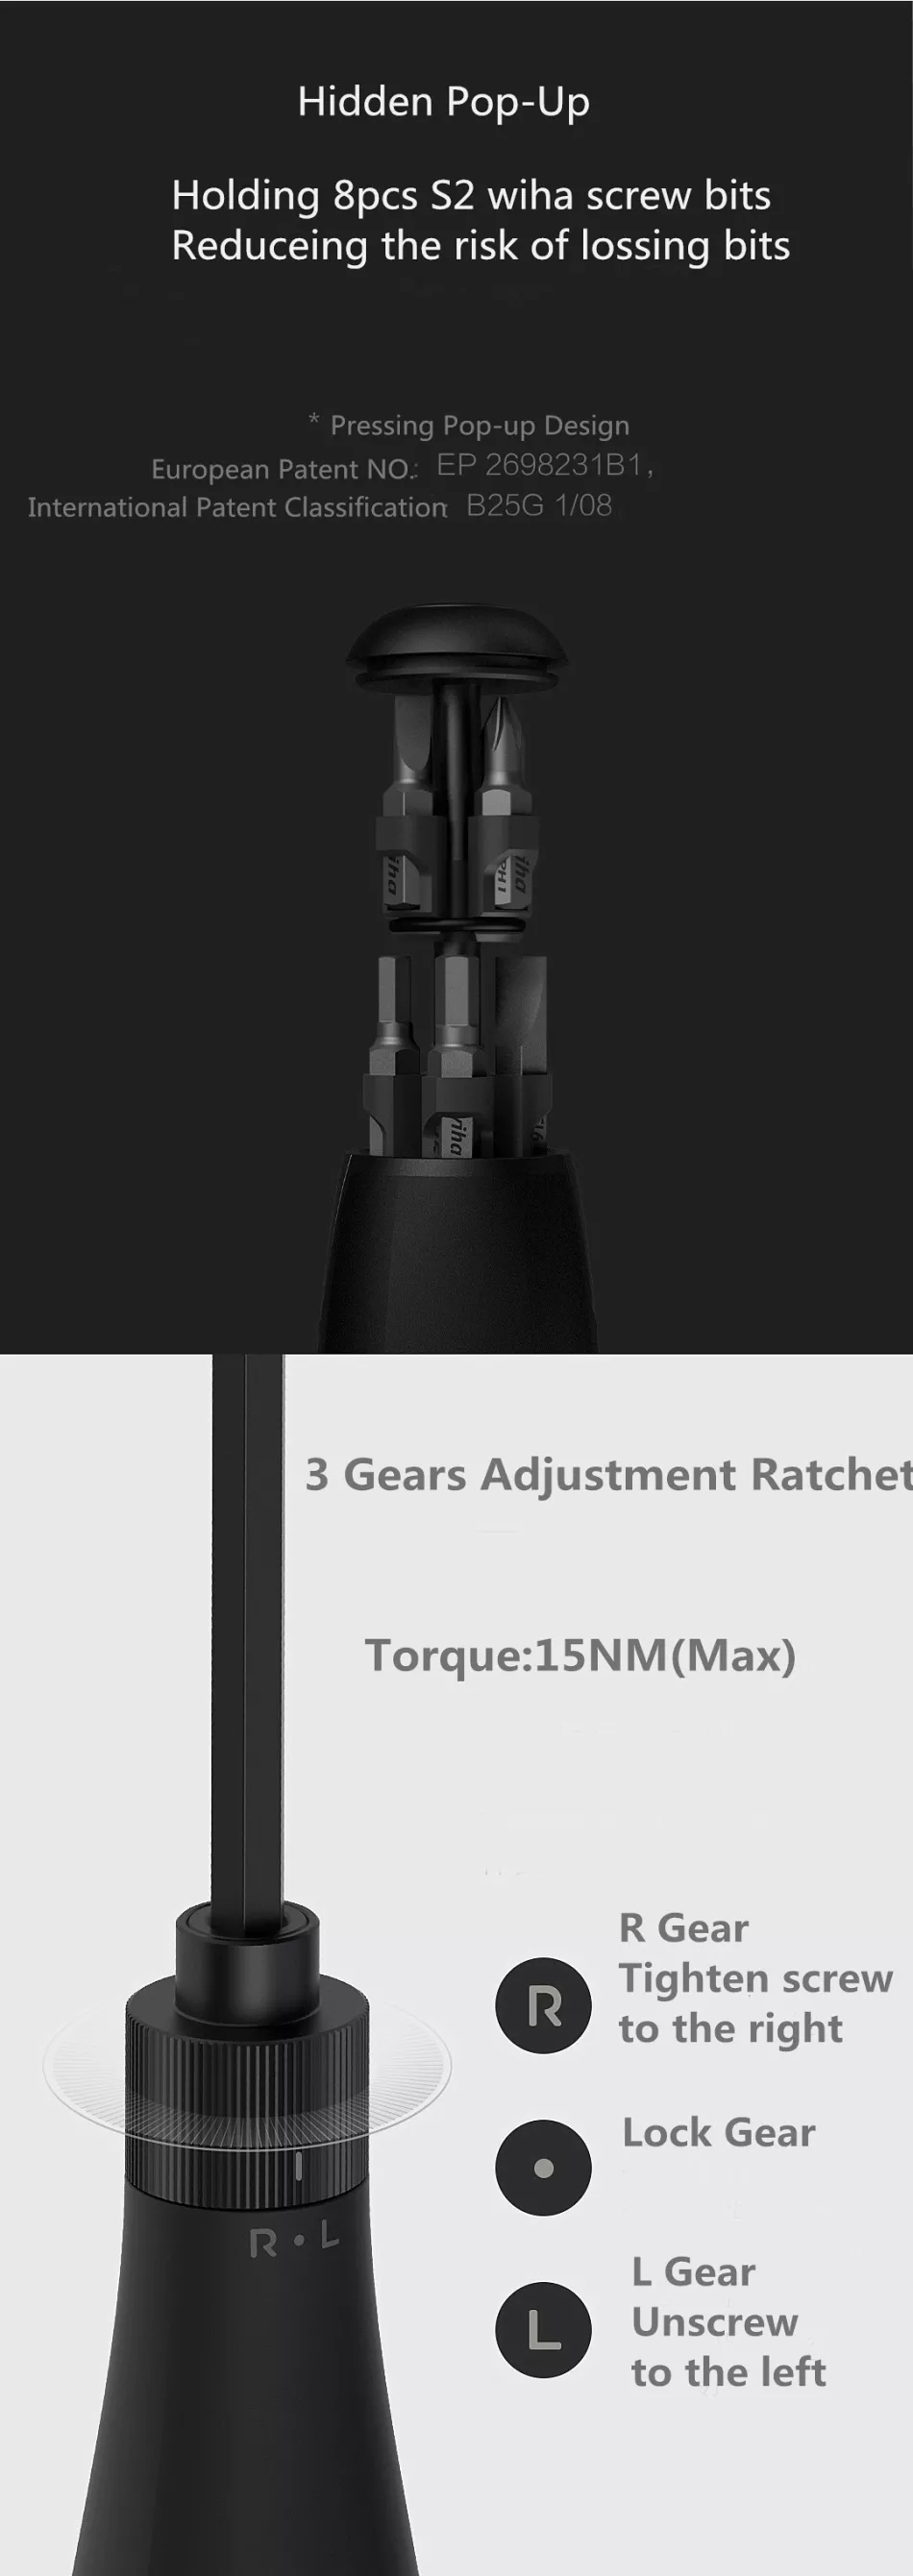 Xiaomi mijia Screwdriver Kit 8 in 1 Precision Magnetic Bits with Extension Rod Alluminum Box DIY Screw Driver Set Repair Tools (4)